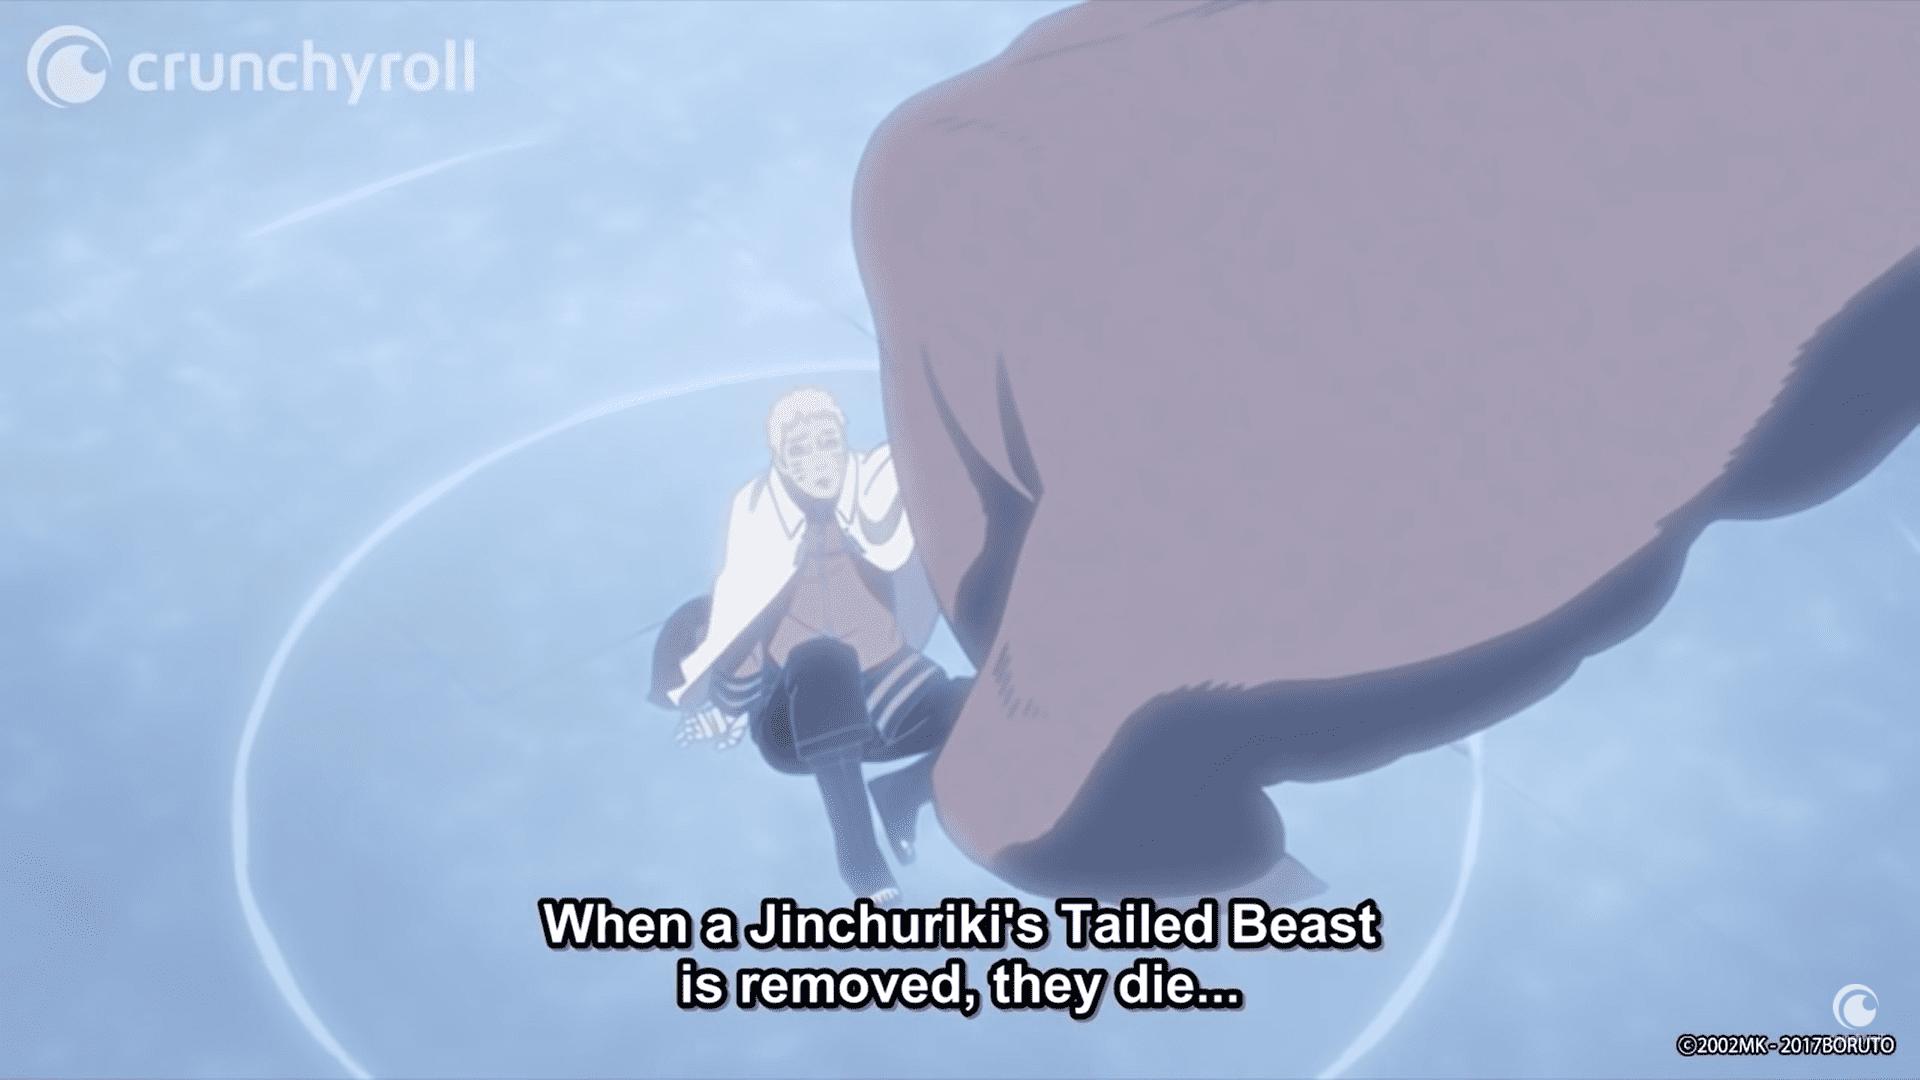 Why did Boruto Stab Sasuke Eye?